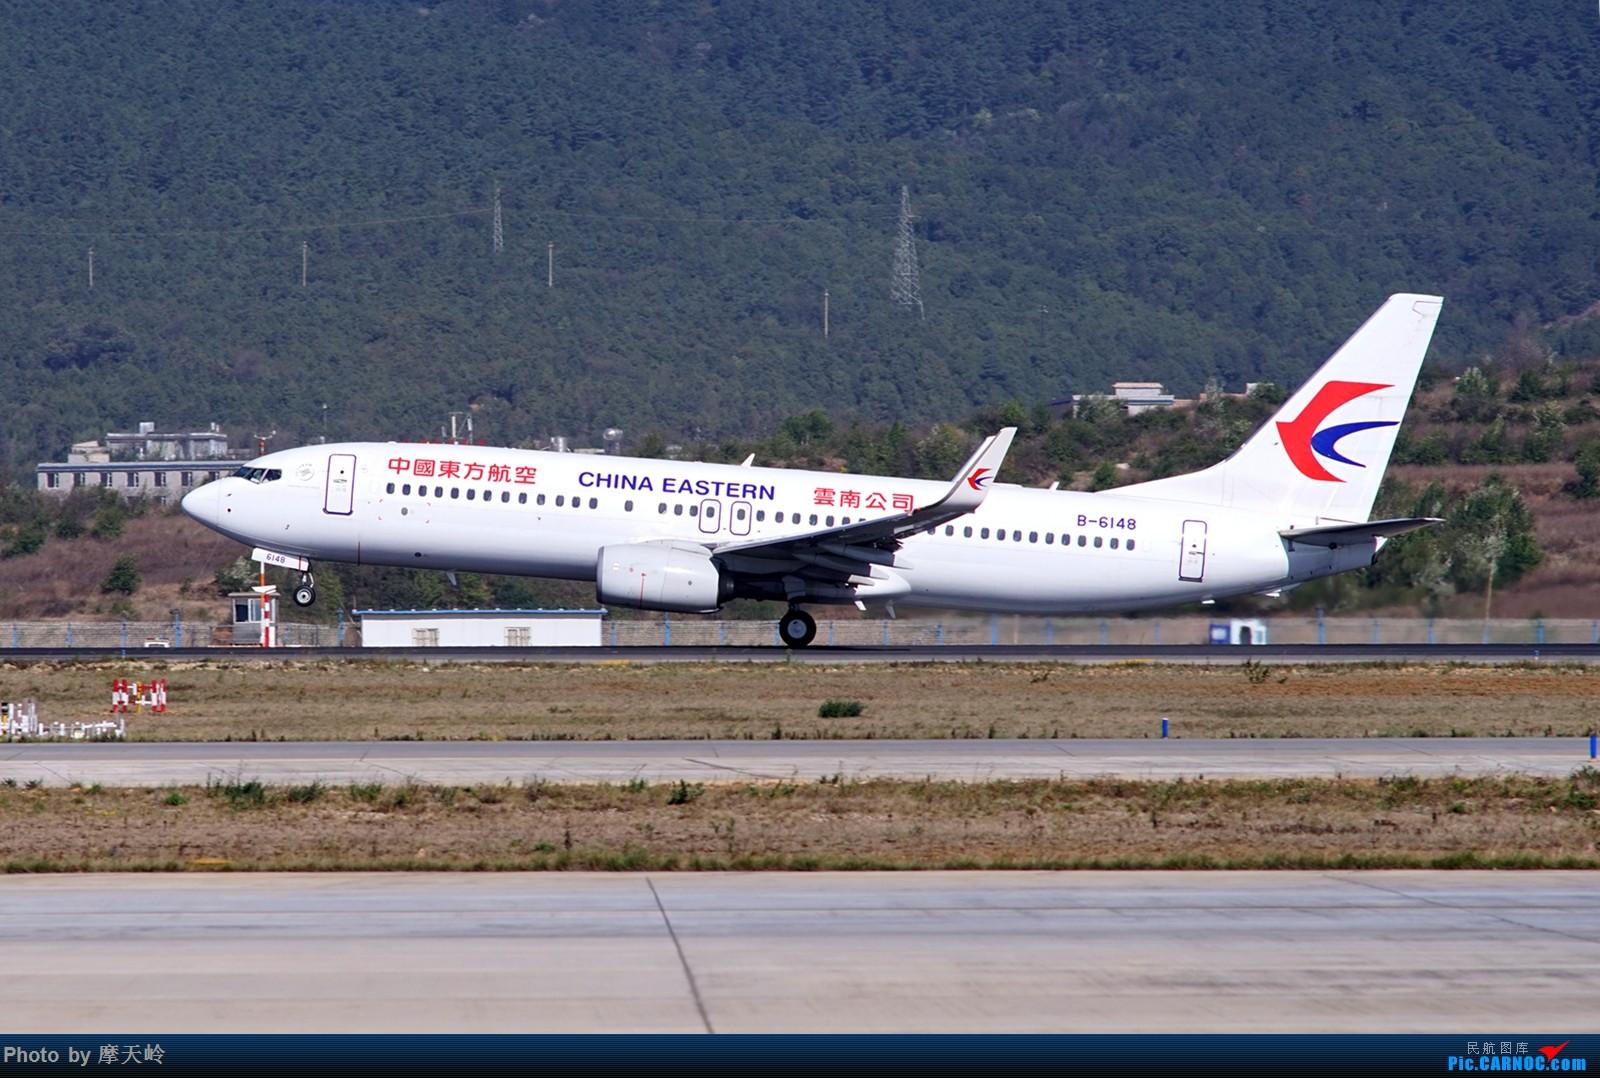 Re:[原创]【昆明长水】内场拍拍拍 BOEING 737-800 B-6148 中国昆明长水国际机场